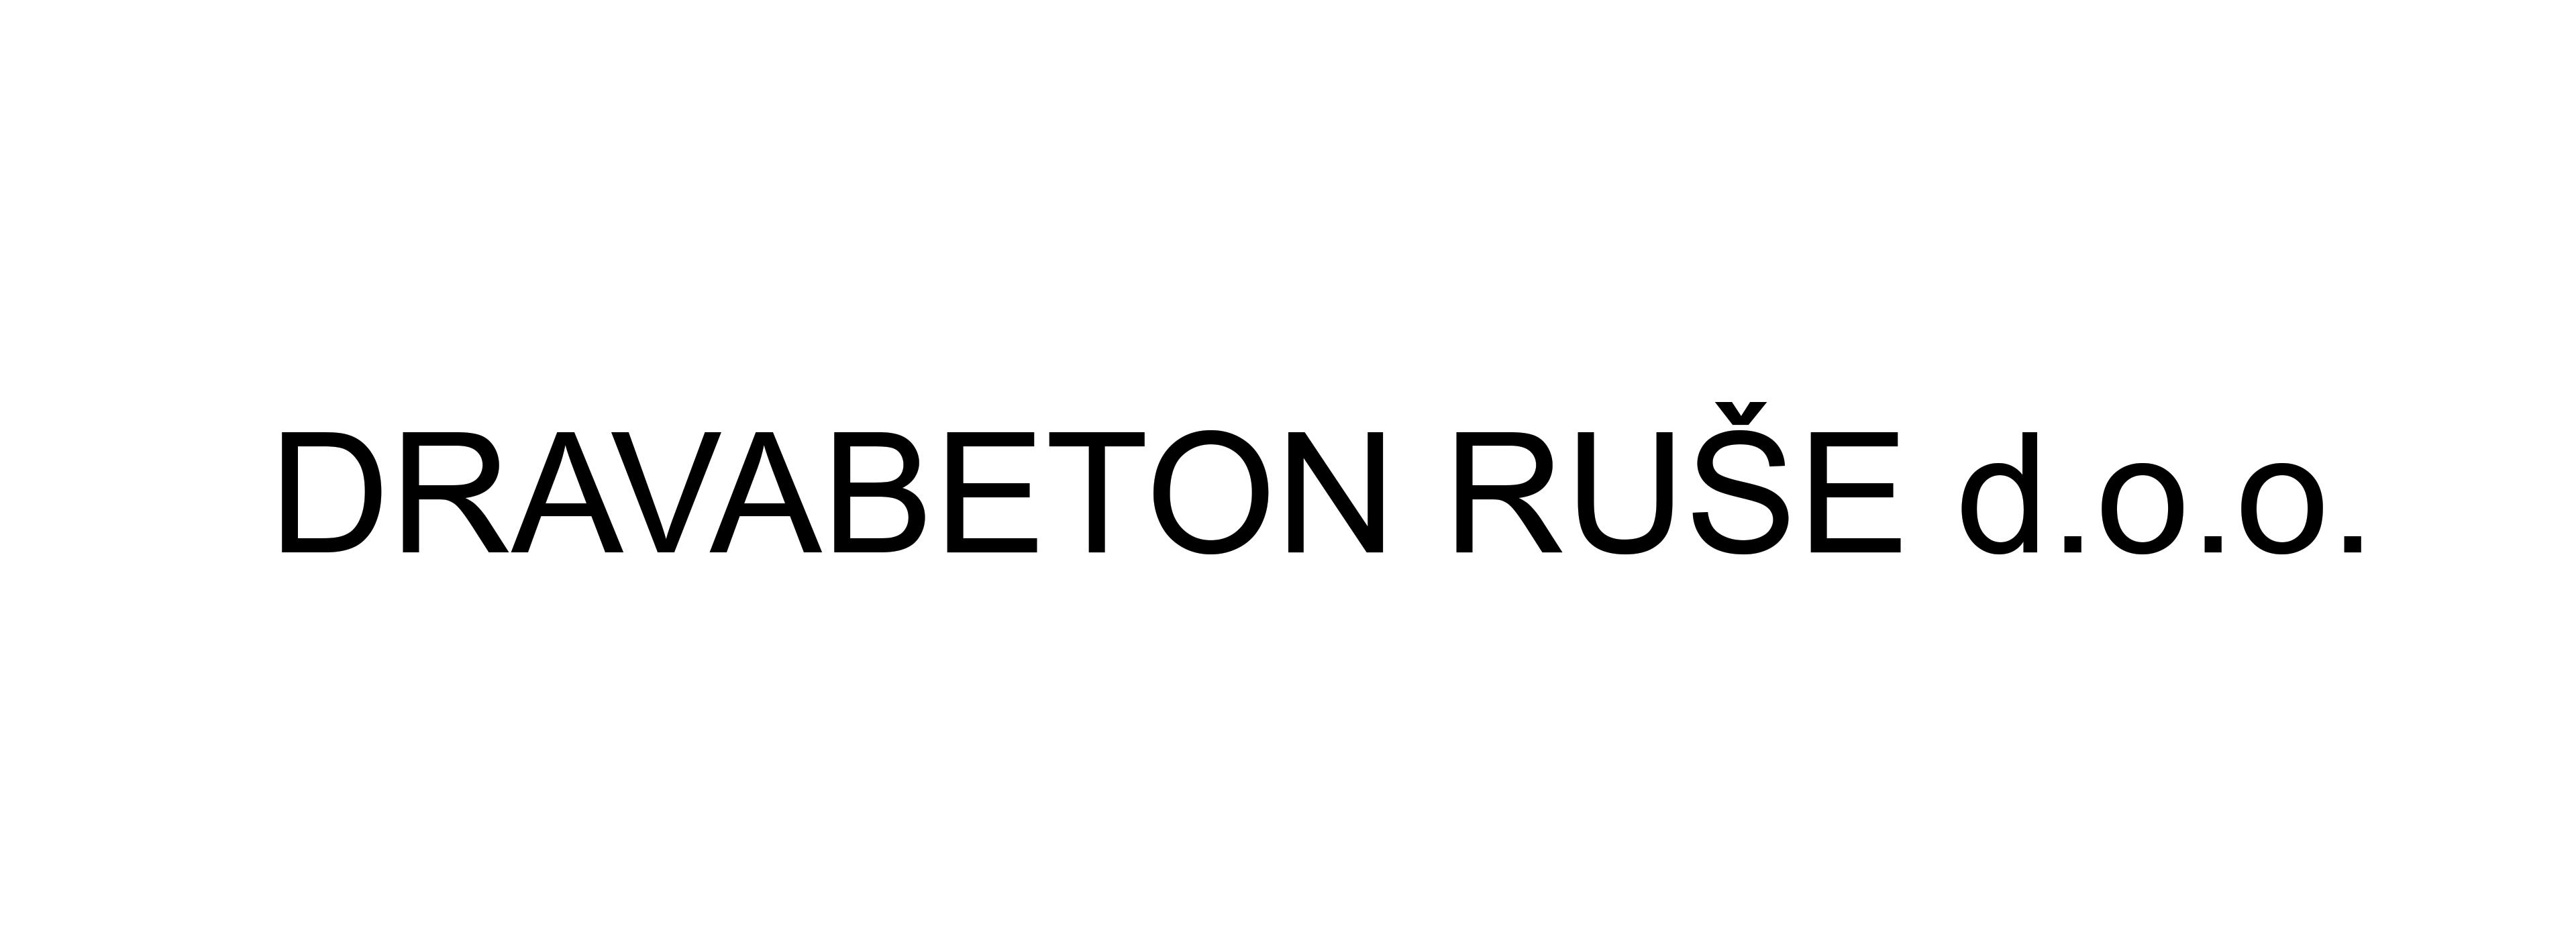 DravaBeton